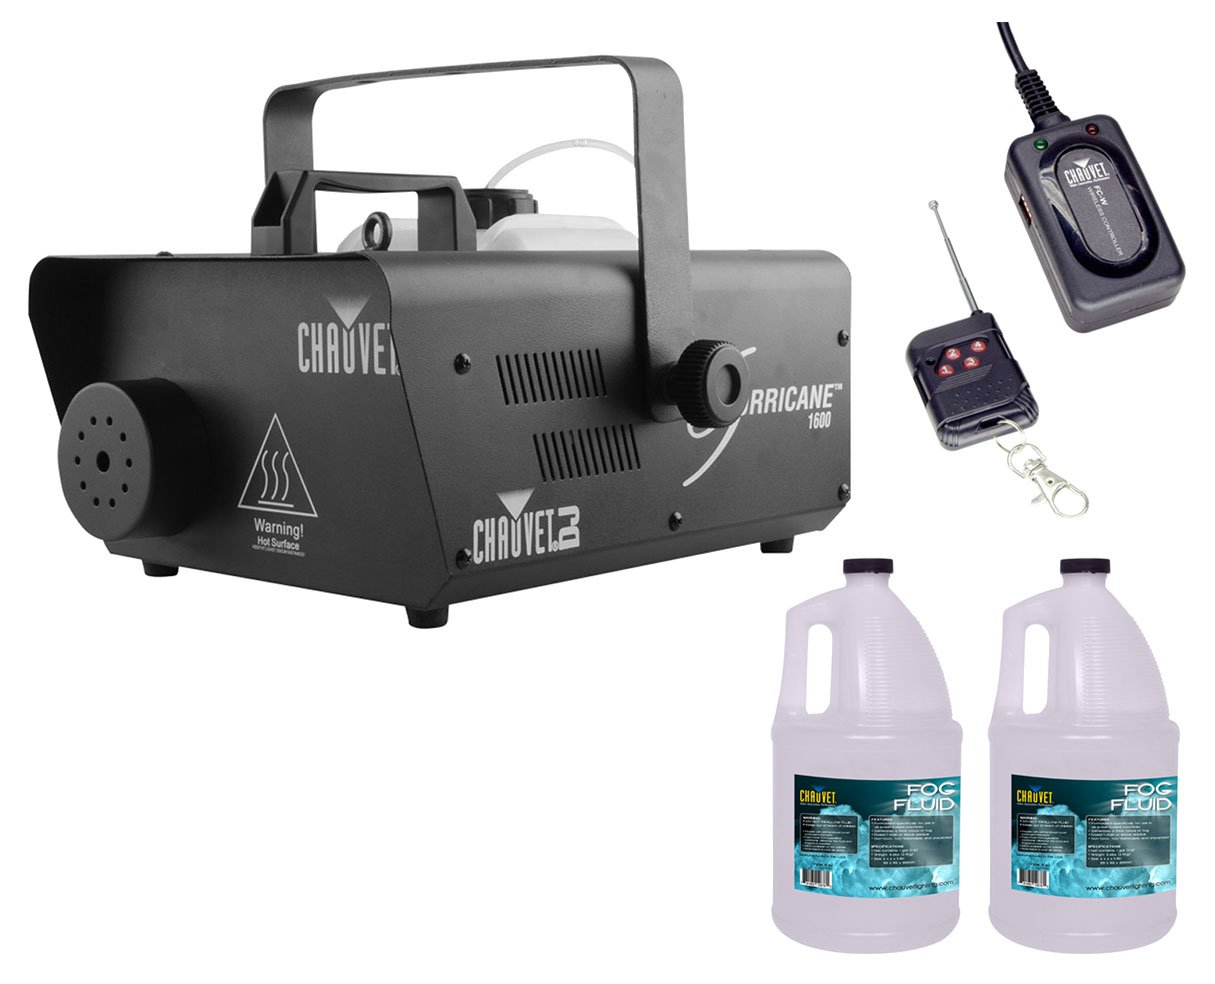 Chauvet H1600 Hurricane 1600 Fog Machine +FC-W Wireless Remote +2x Fluid Gallon by Chauvet